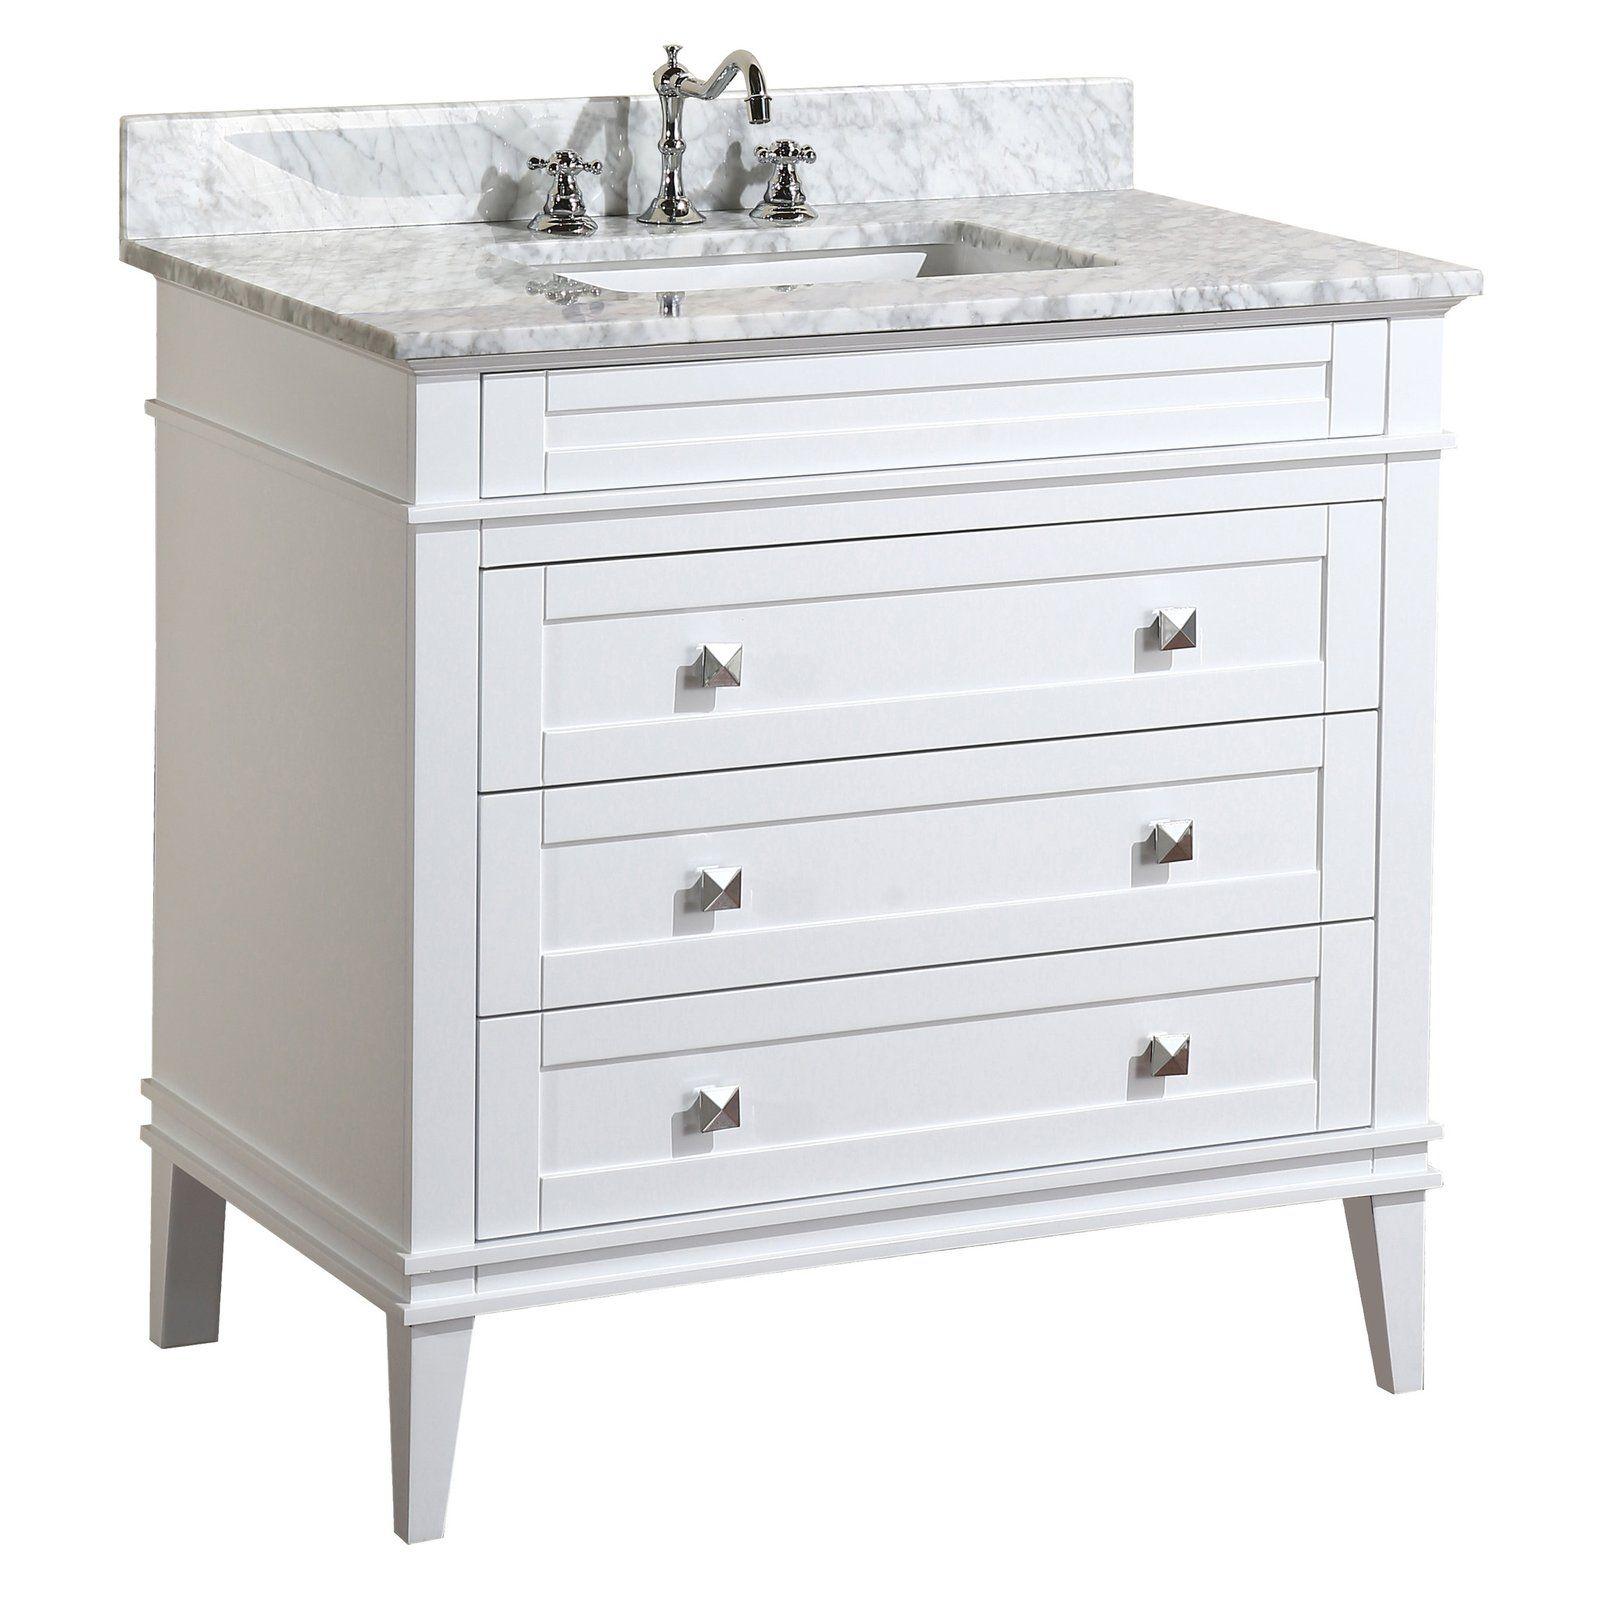 Eleanor 36 Inch Vanity With Carrara Marble Top 36 Inch Bathroom Vanity 36 Inch Vanity Single Bathroom Vanity